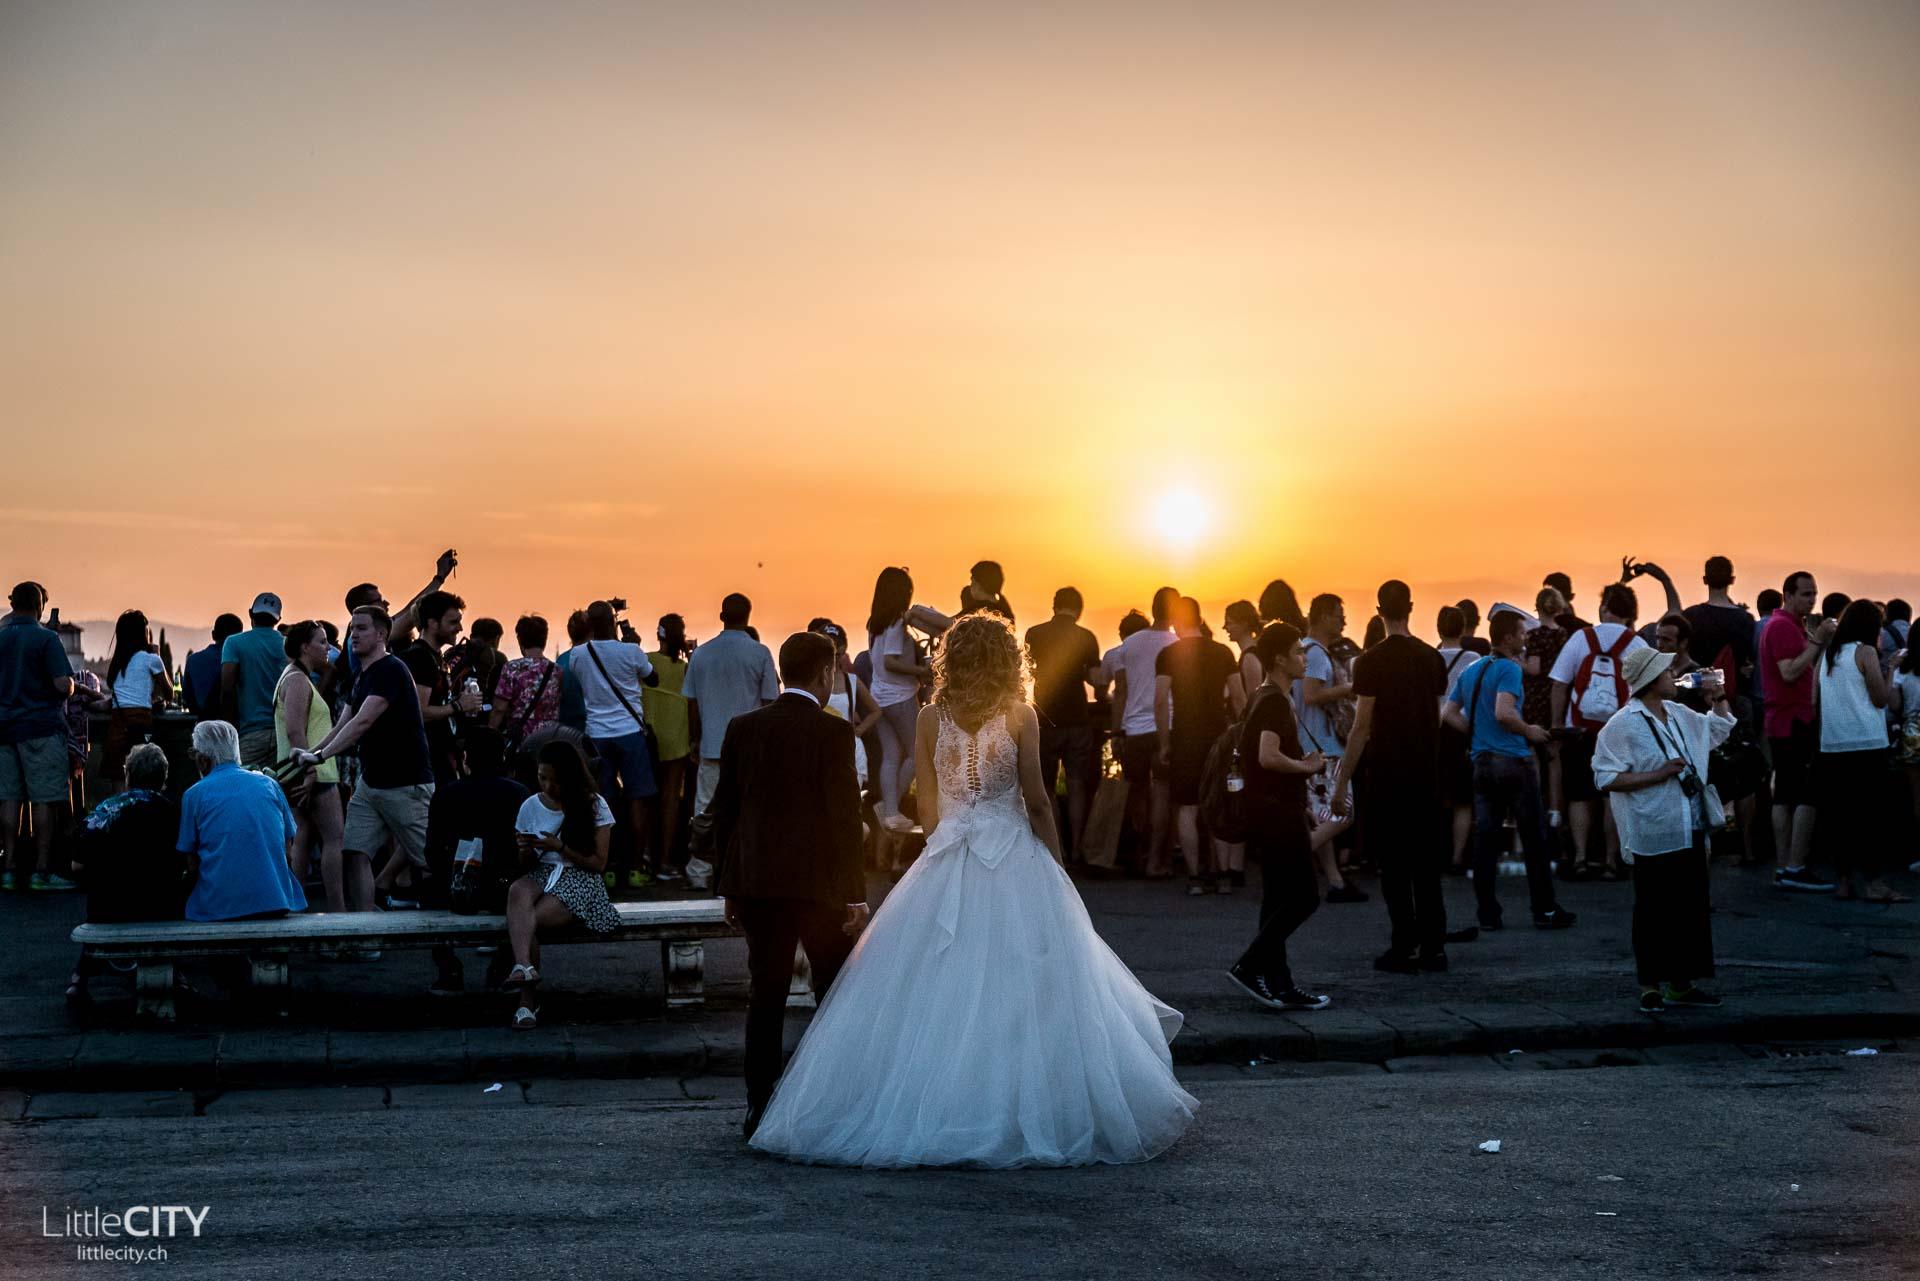 Florenz Piazzale Michelangelo Wedding Shoot Sunset